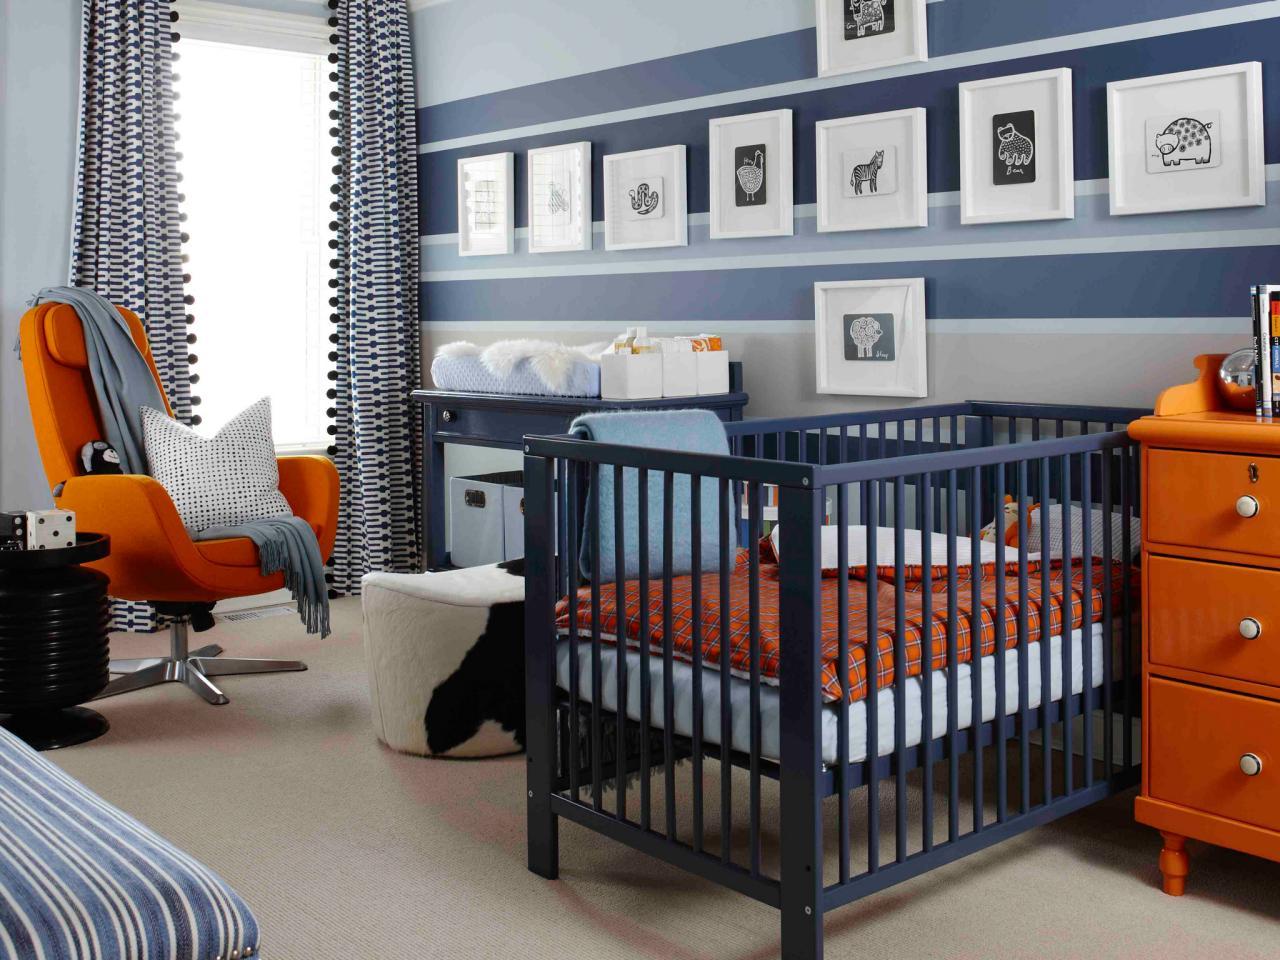 Warm Bedroom Color Schemes Pictures Options Amp Ideas